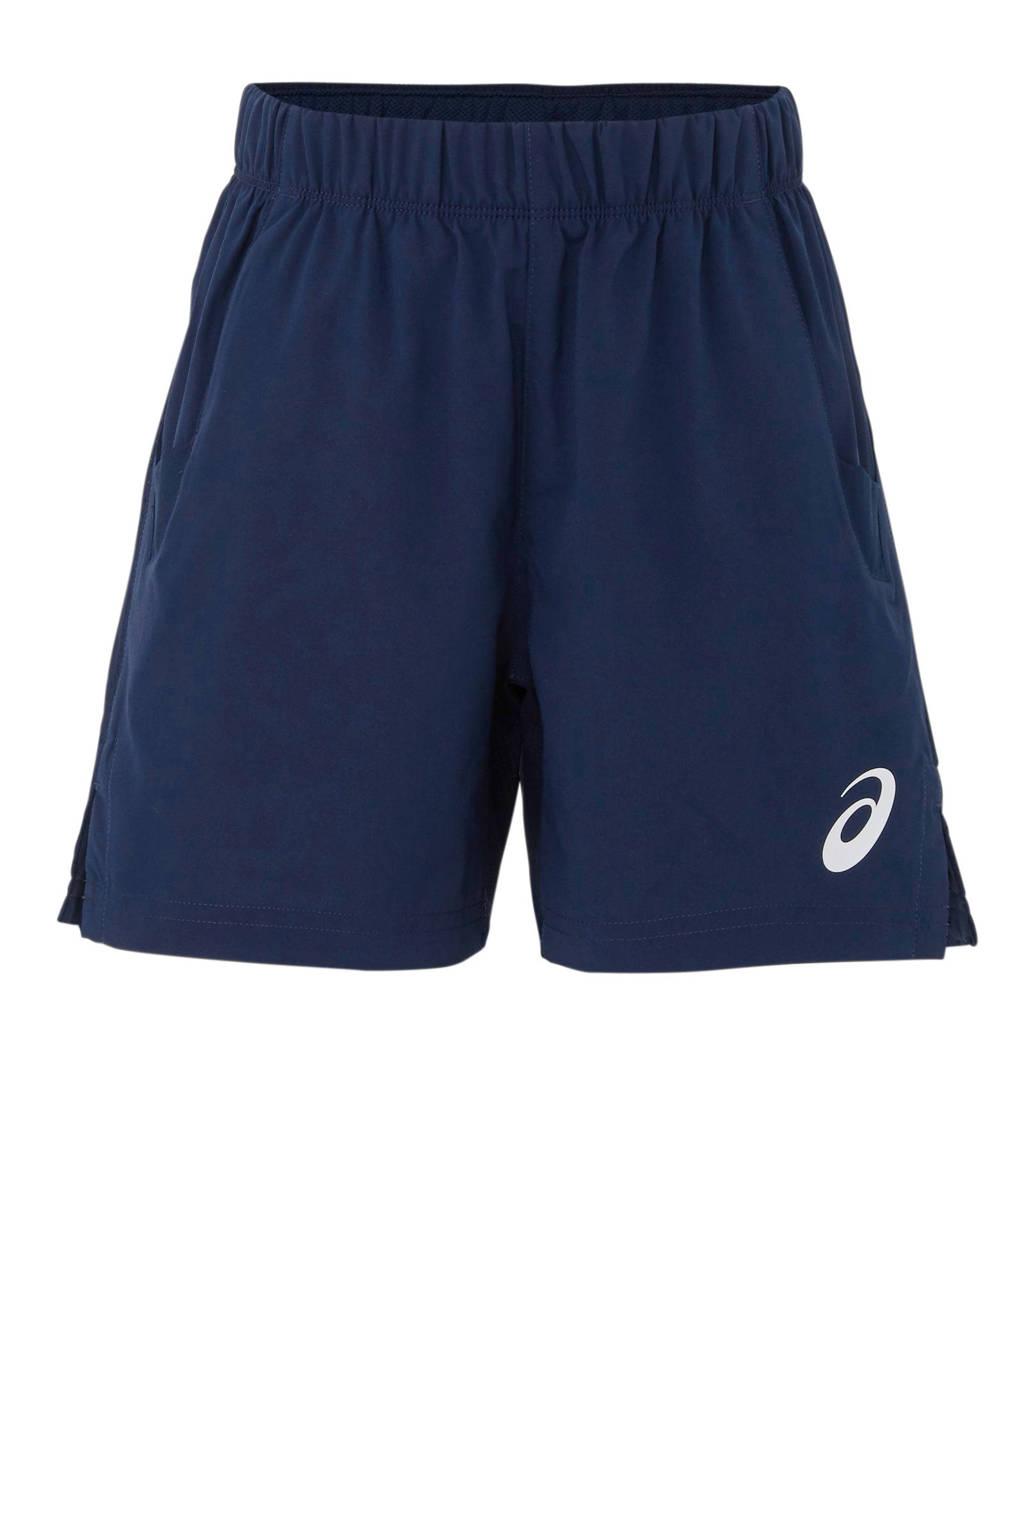 ASICS   sportshort donkerblauw, Donkerblauw